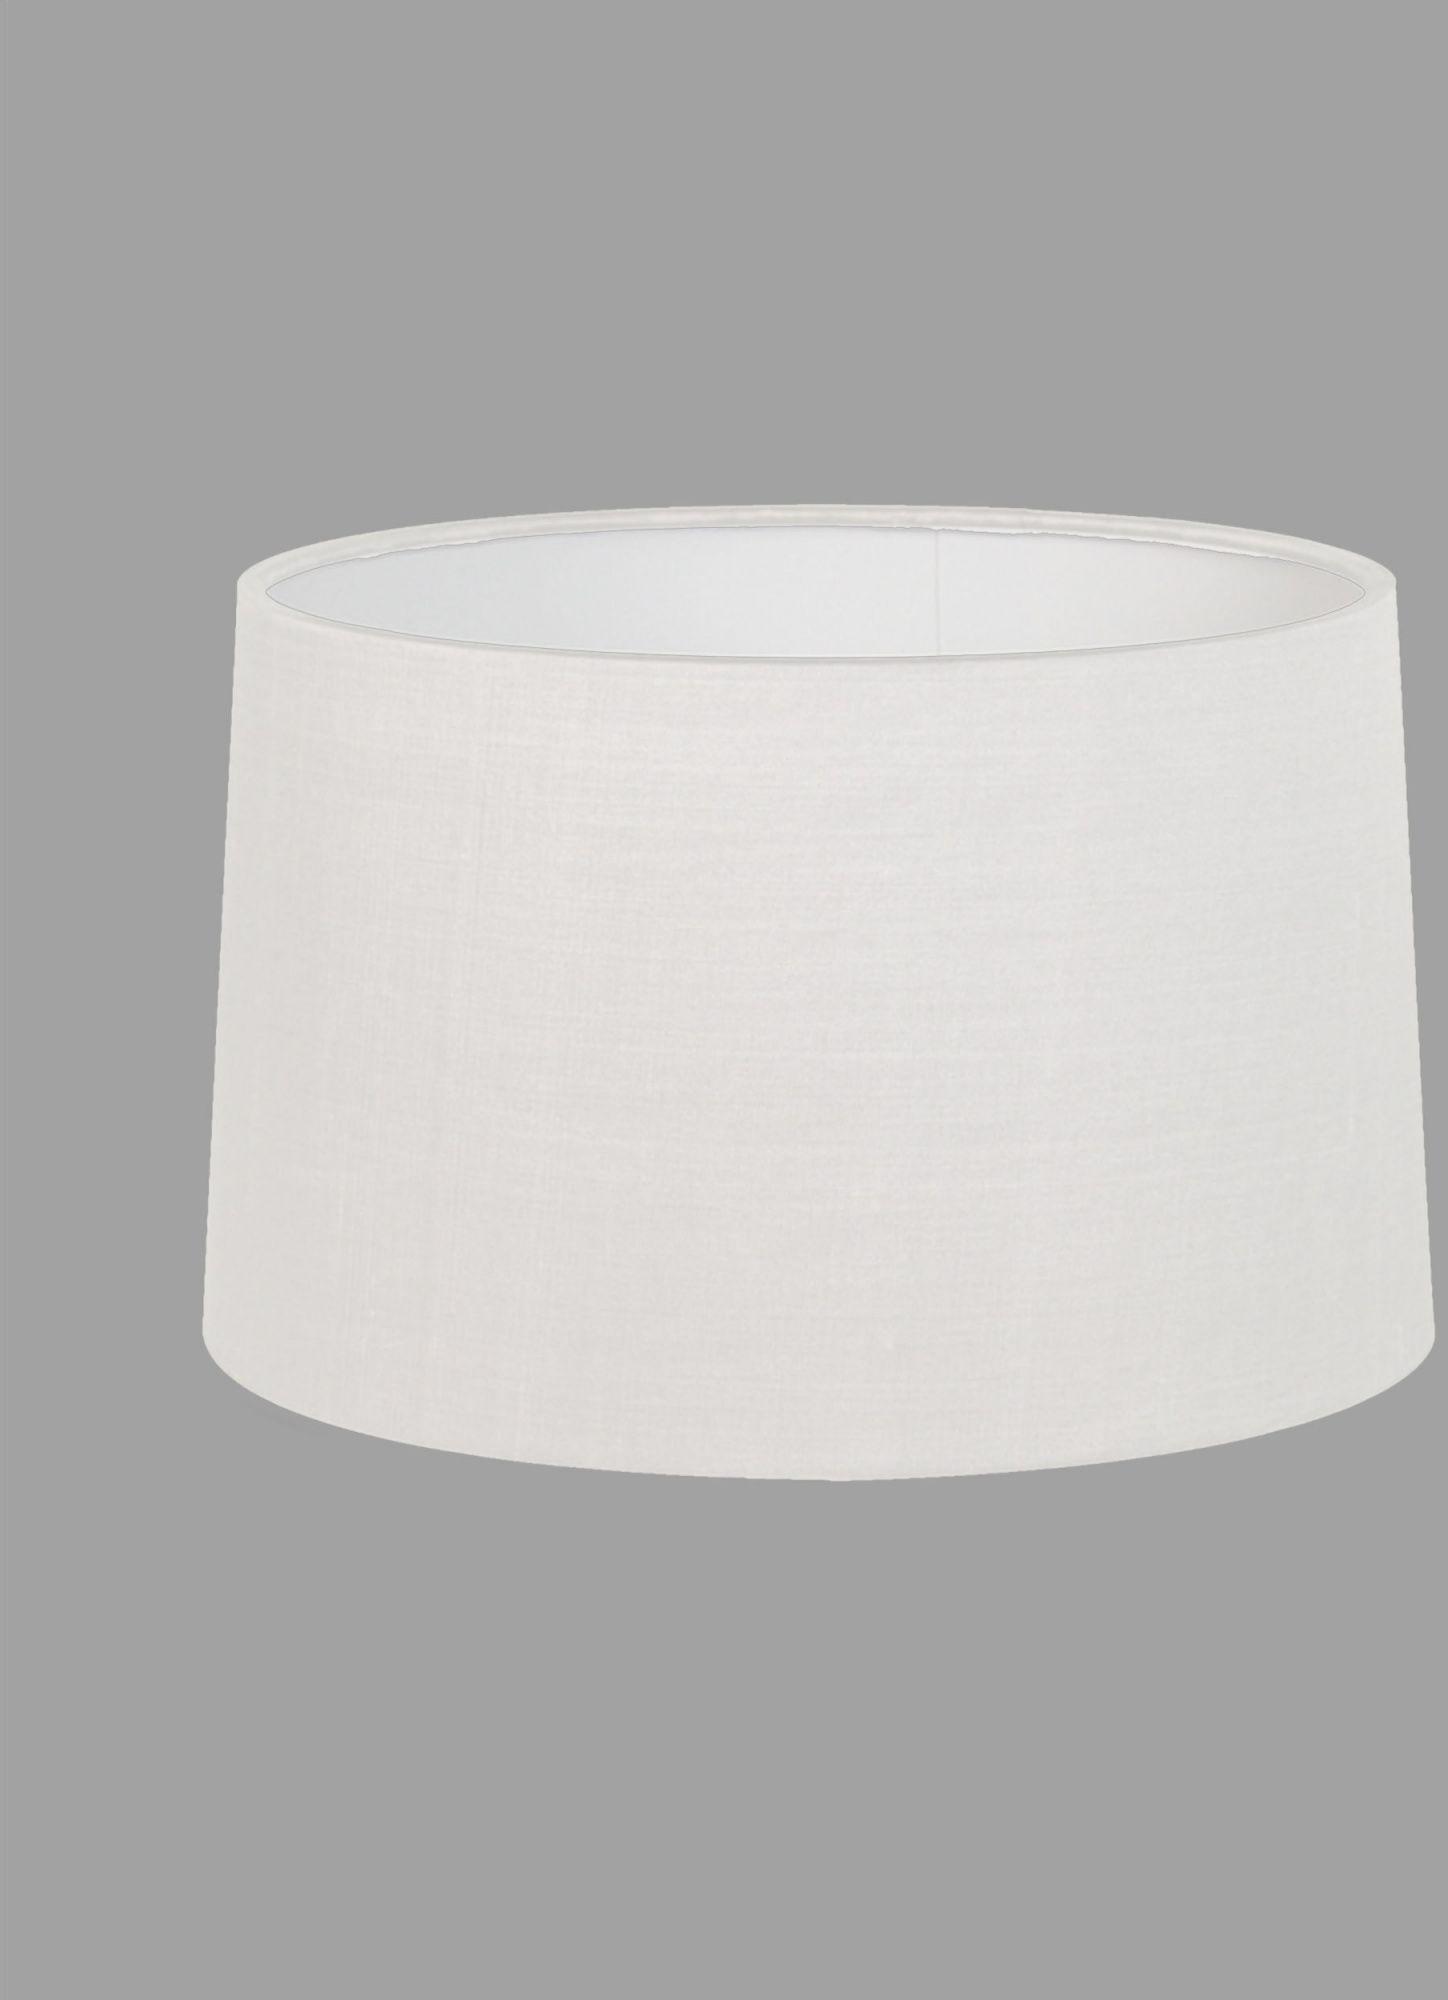 Abażur Azumi Round 4024 Biały Astro Lighting